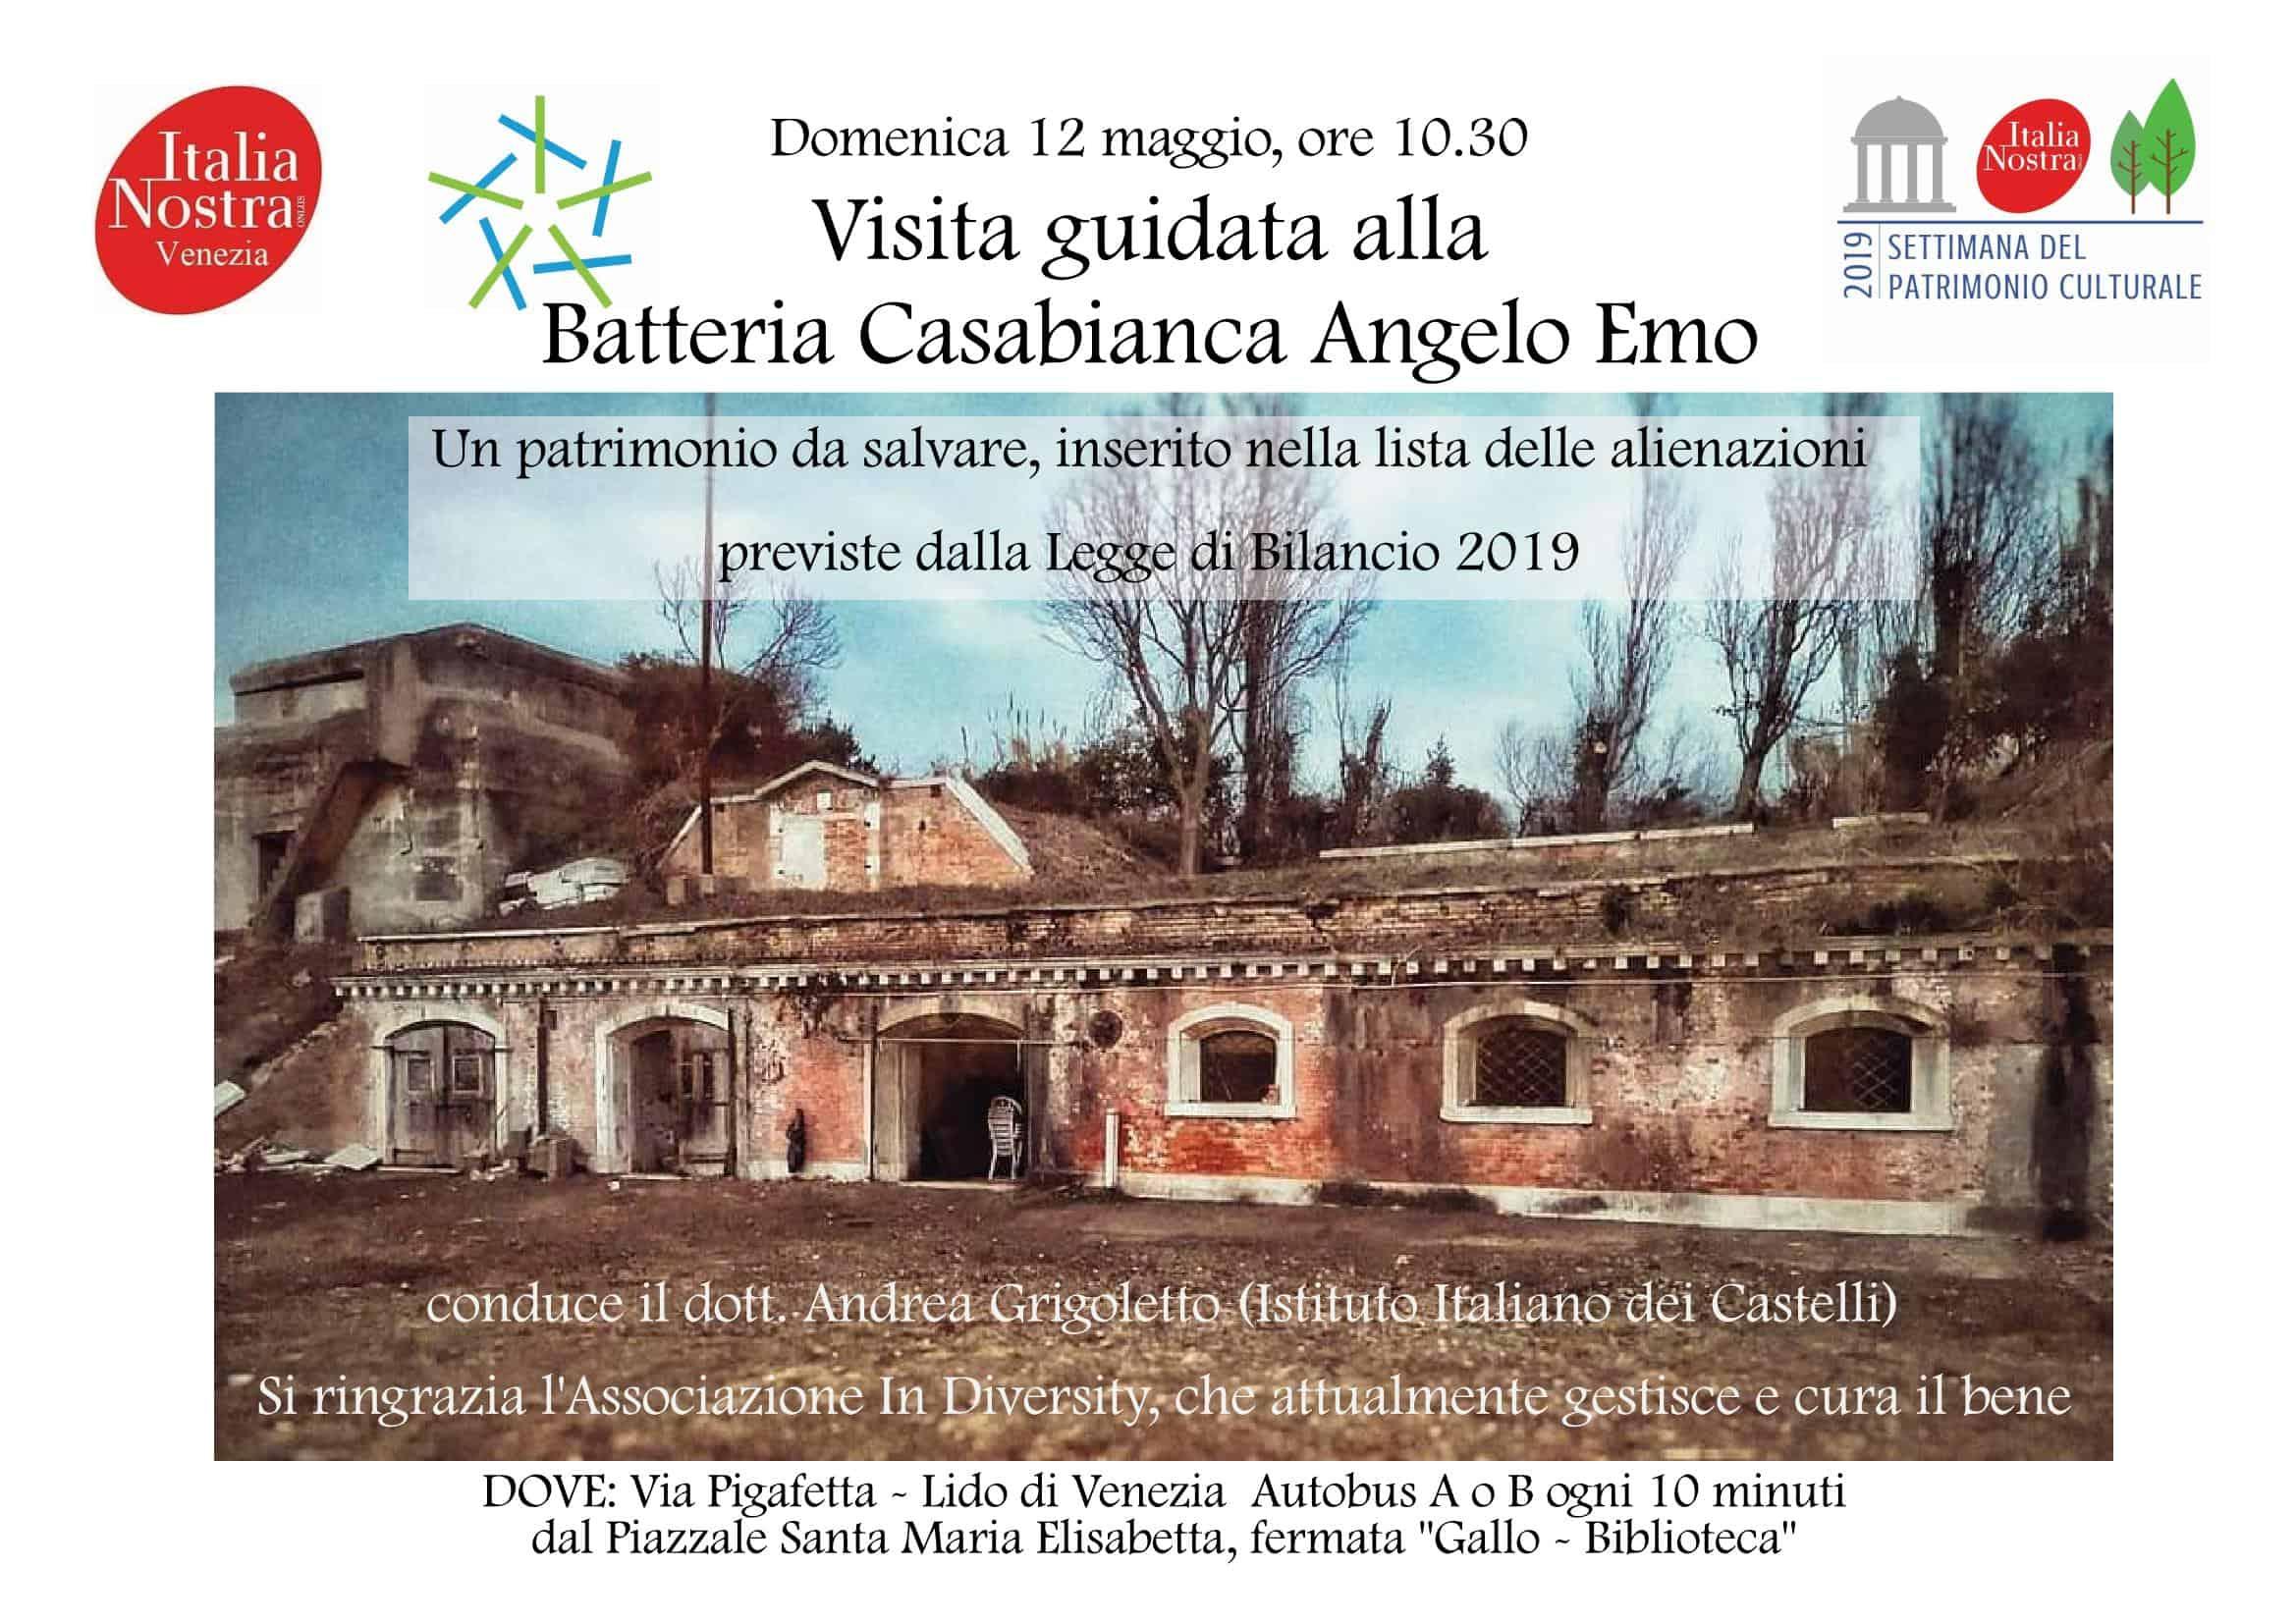 Visita guidata alla Batteria Casabianca Angelo Emo con Italia Nostra